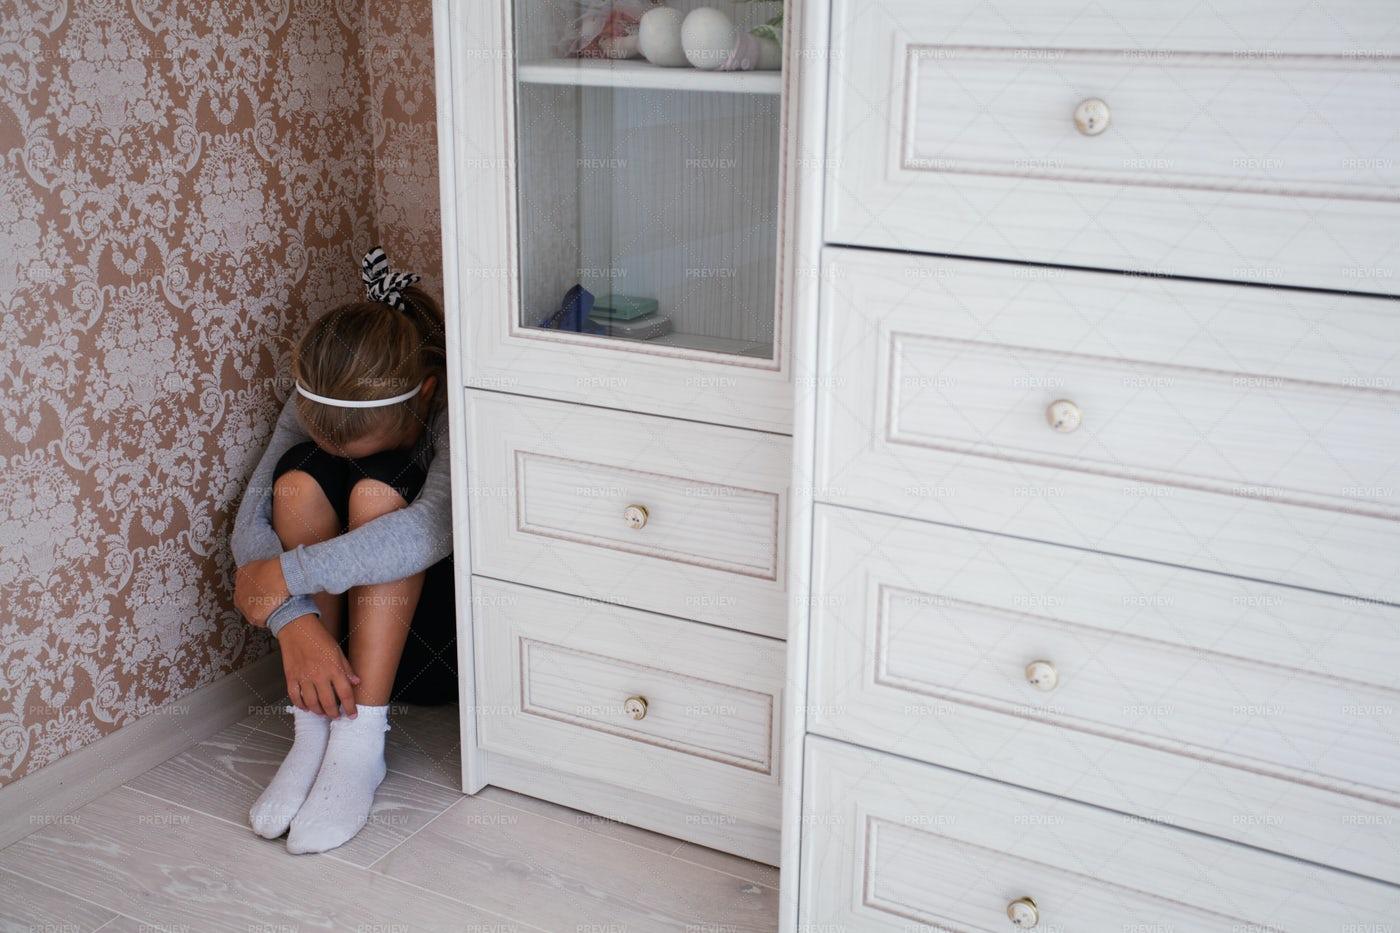 Sad Girl In Corner: Stock Photos